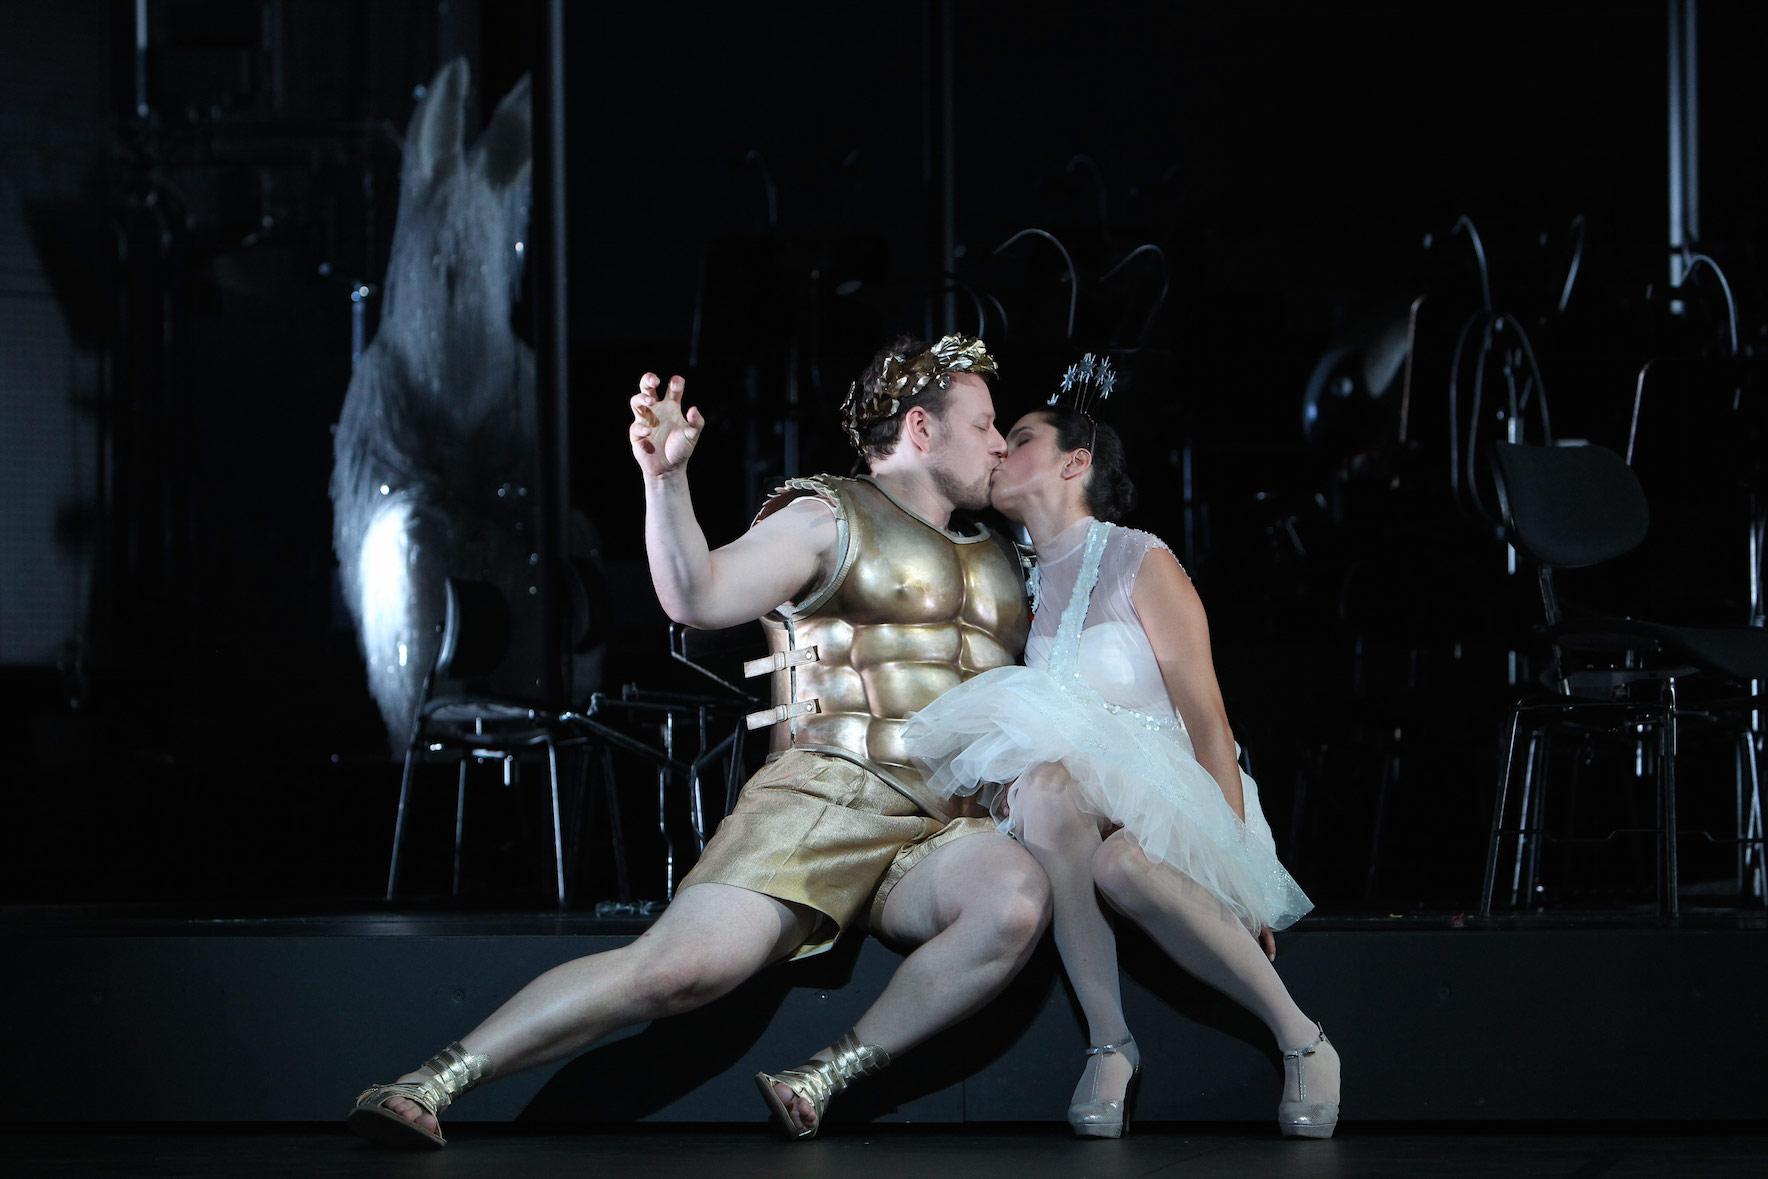 Theater Bremen, Parsifal   with: Nadine Lehner  photo credit: Jörg Landsberg